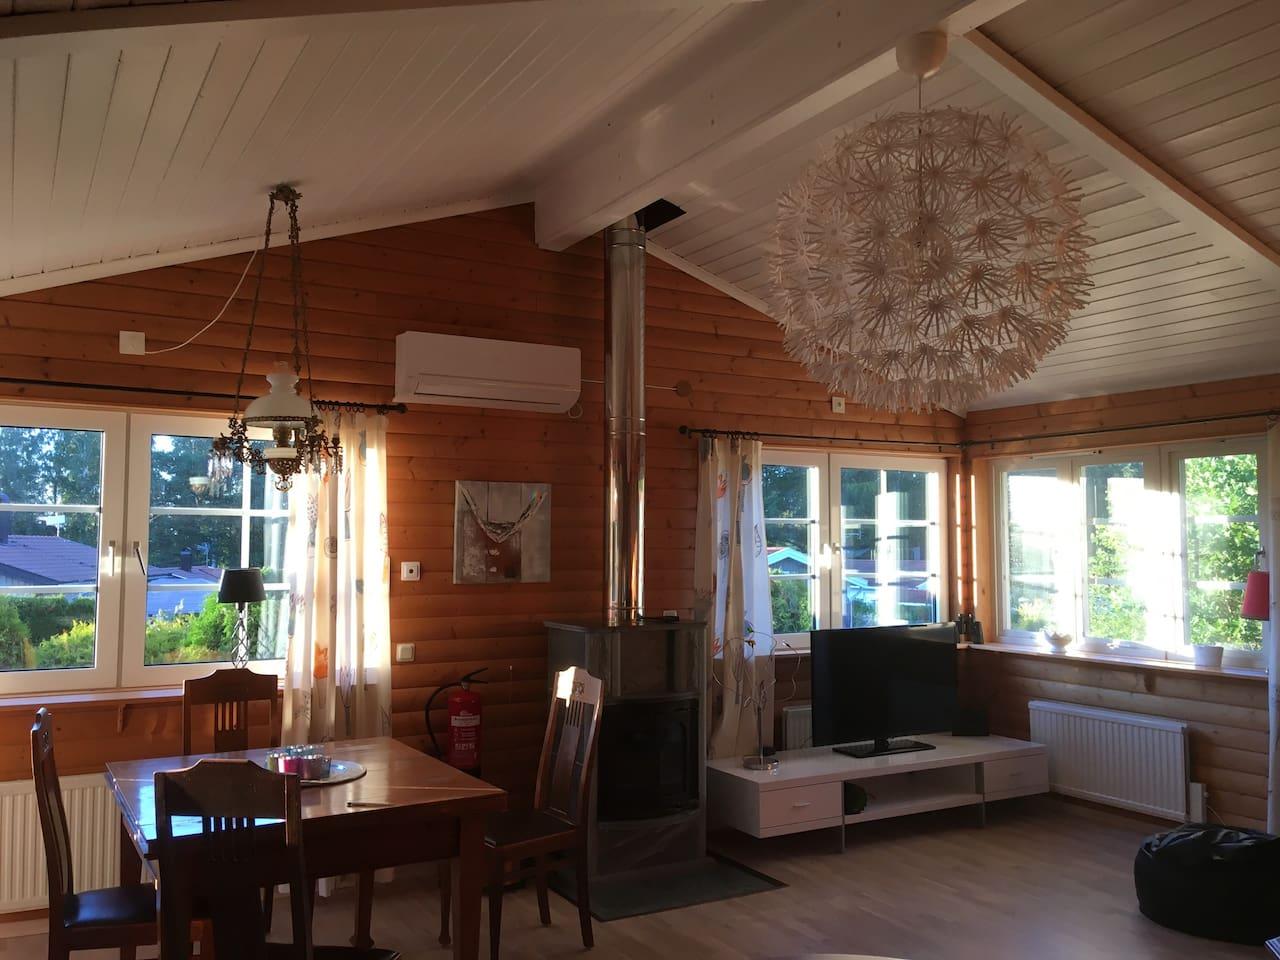 Allrummet / Living room